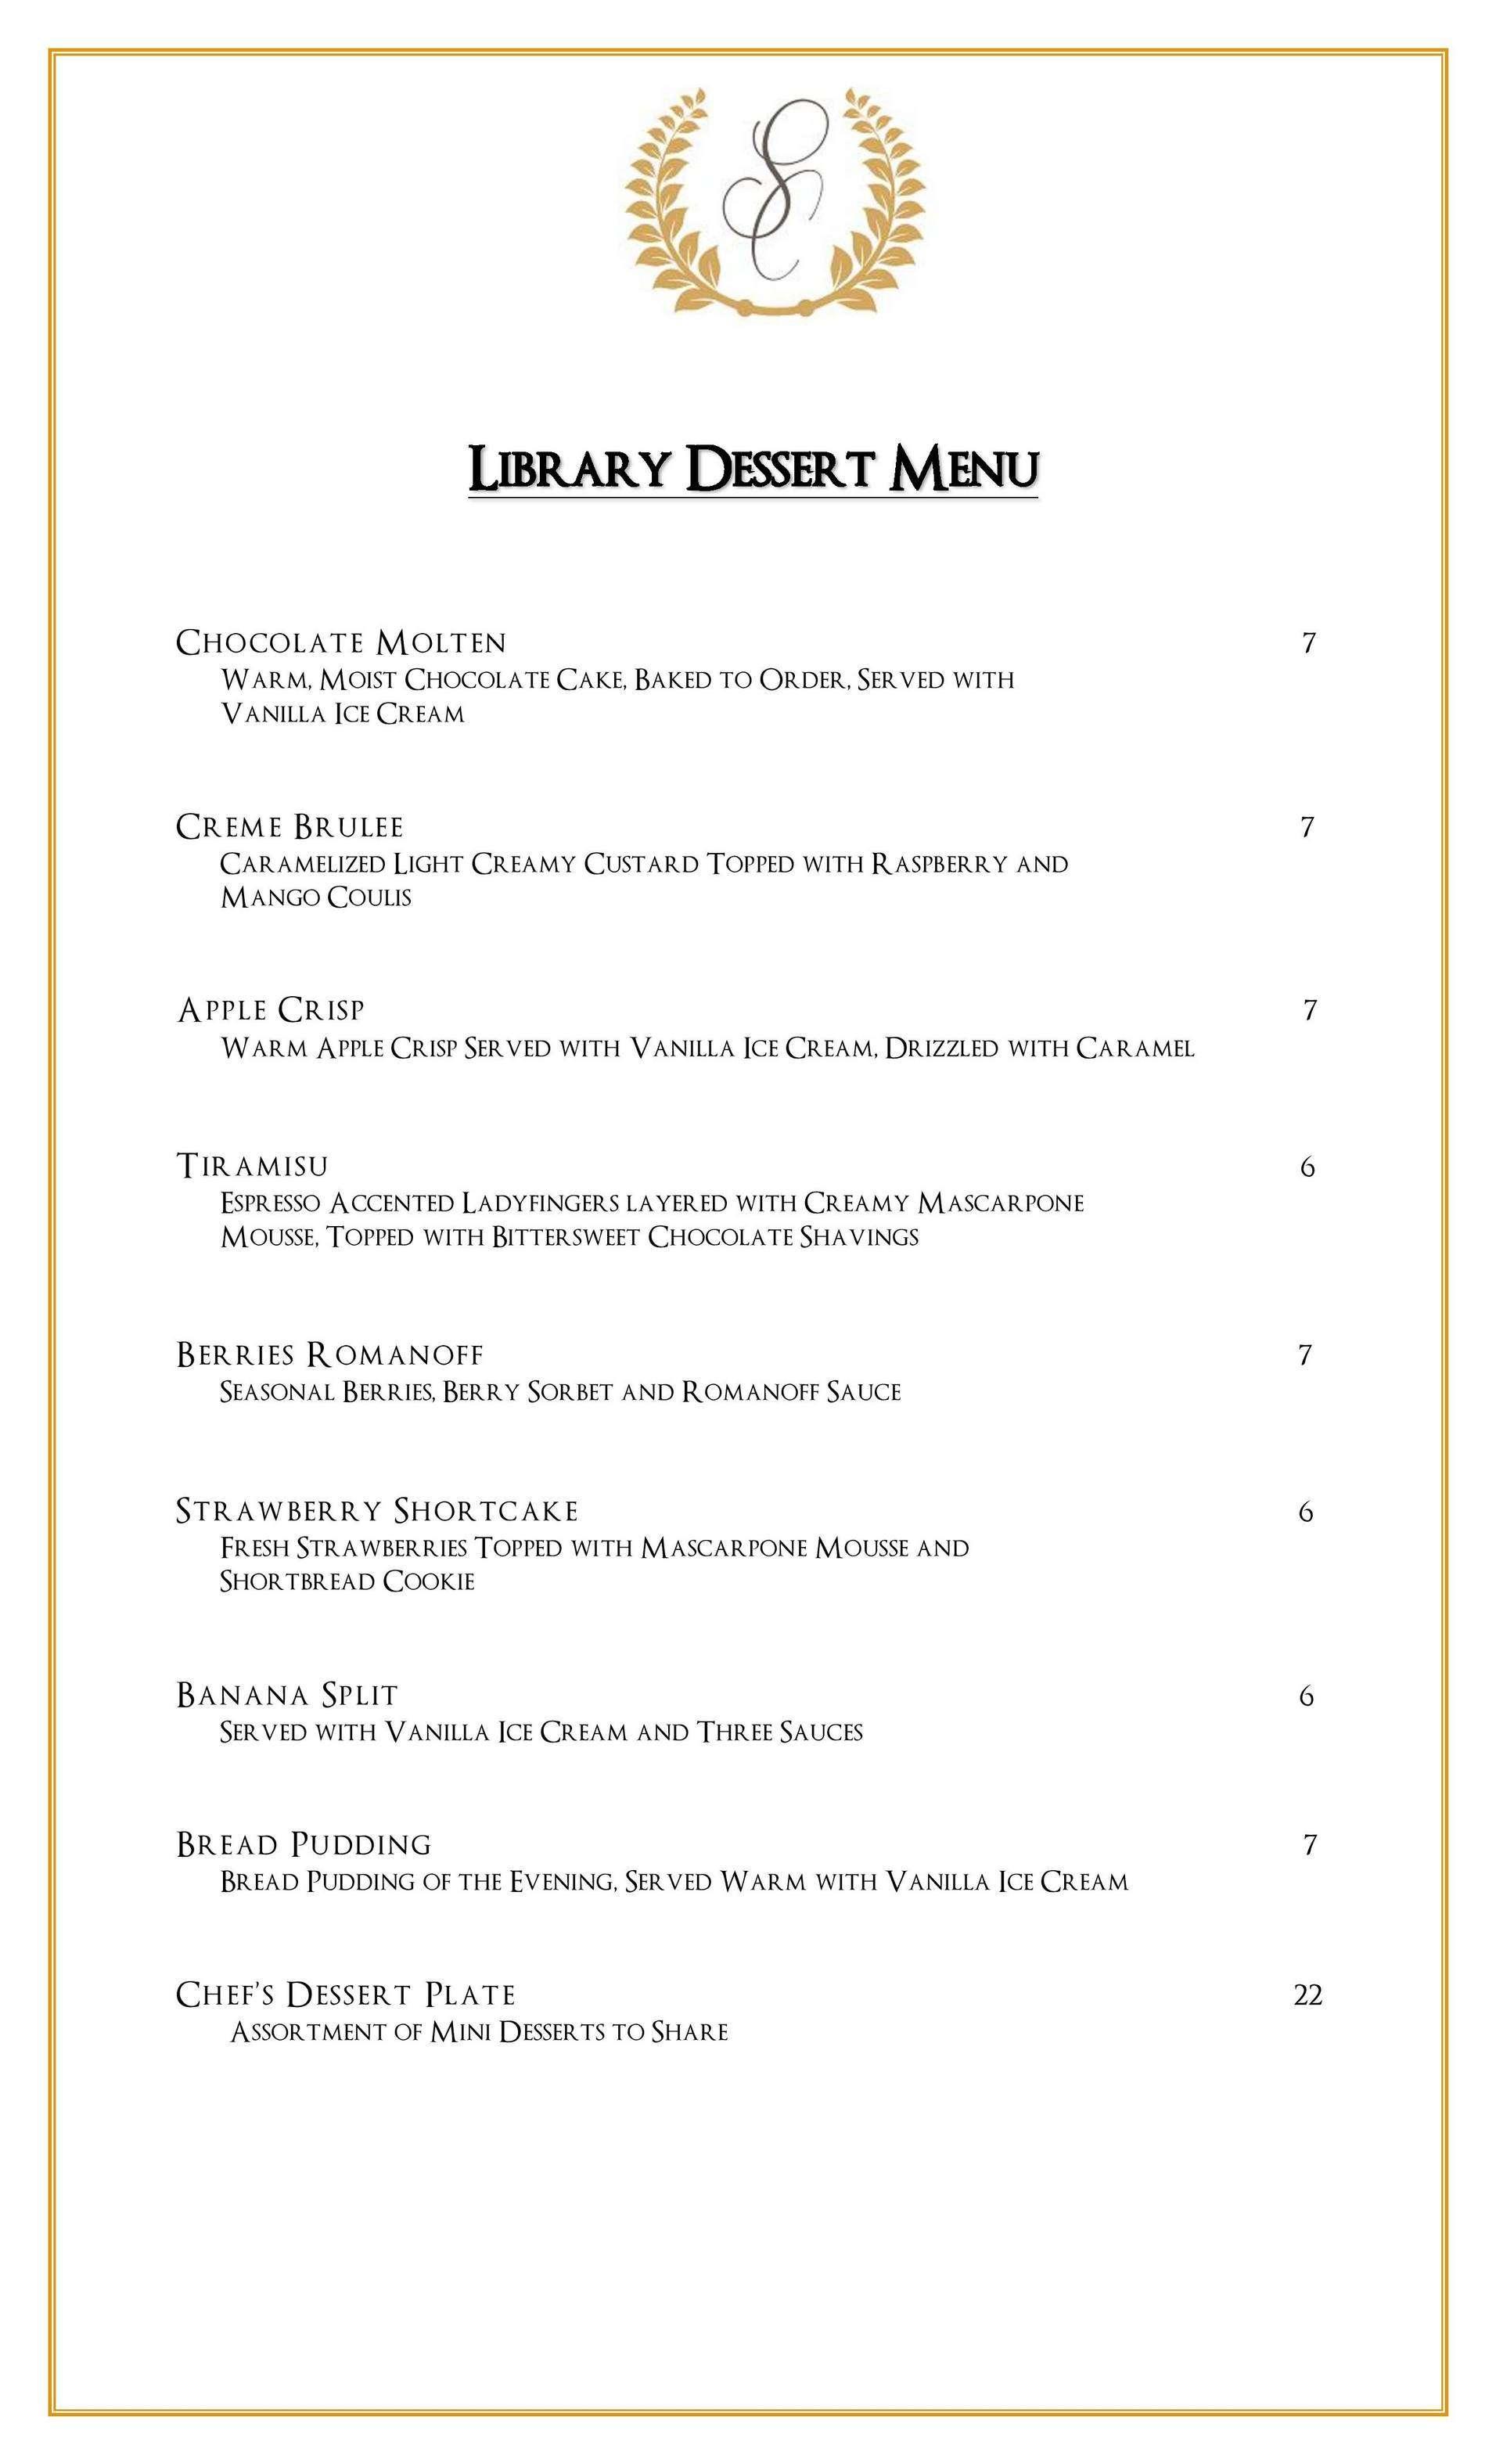 Library Dessert-menu_tn